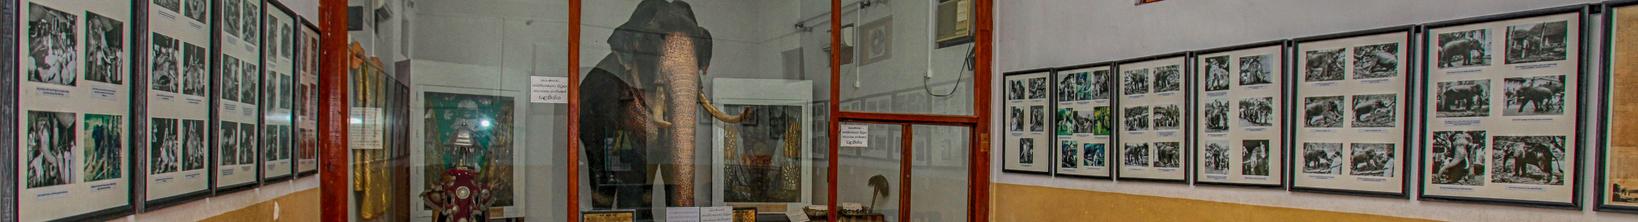 Raja Museum, Kandy